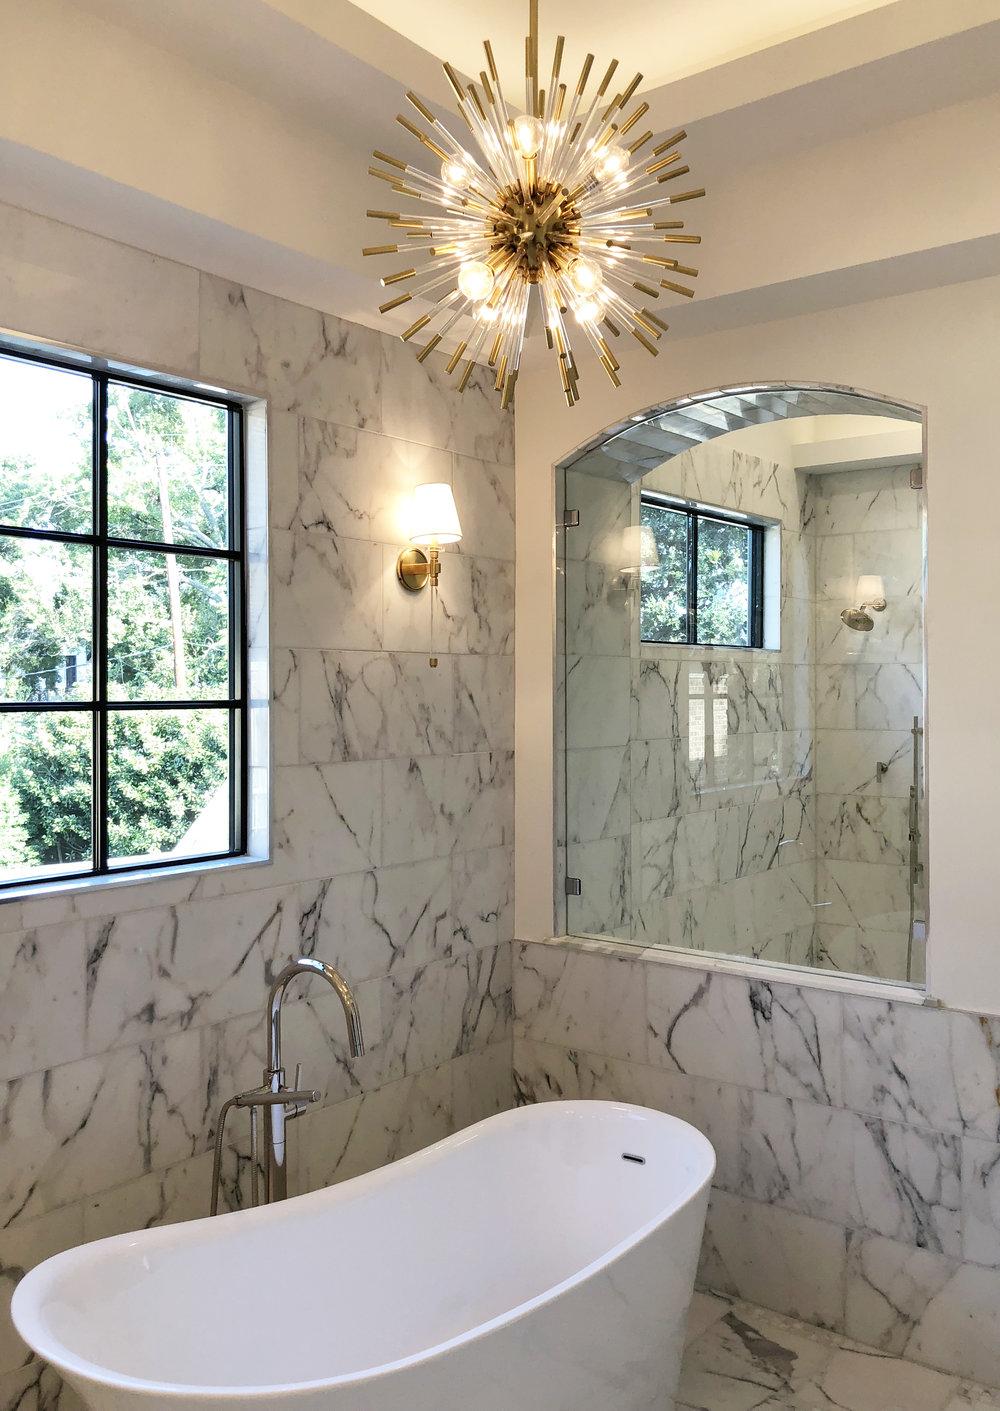 Freestanding bathtub with Sputnik chandelier in an all marble master bathroom designed by Berlin interior designer Jamie House. Built by CM Batts Developers. Jamie House Design